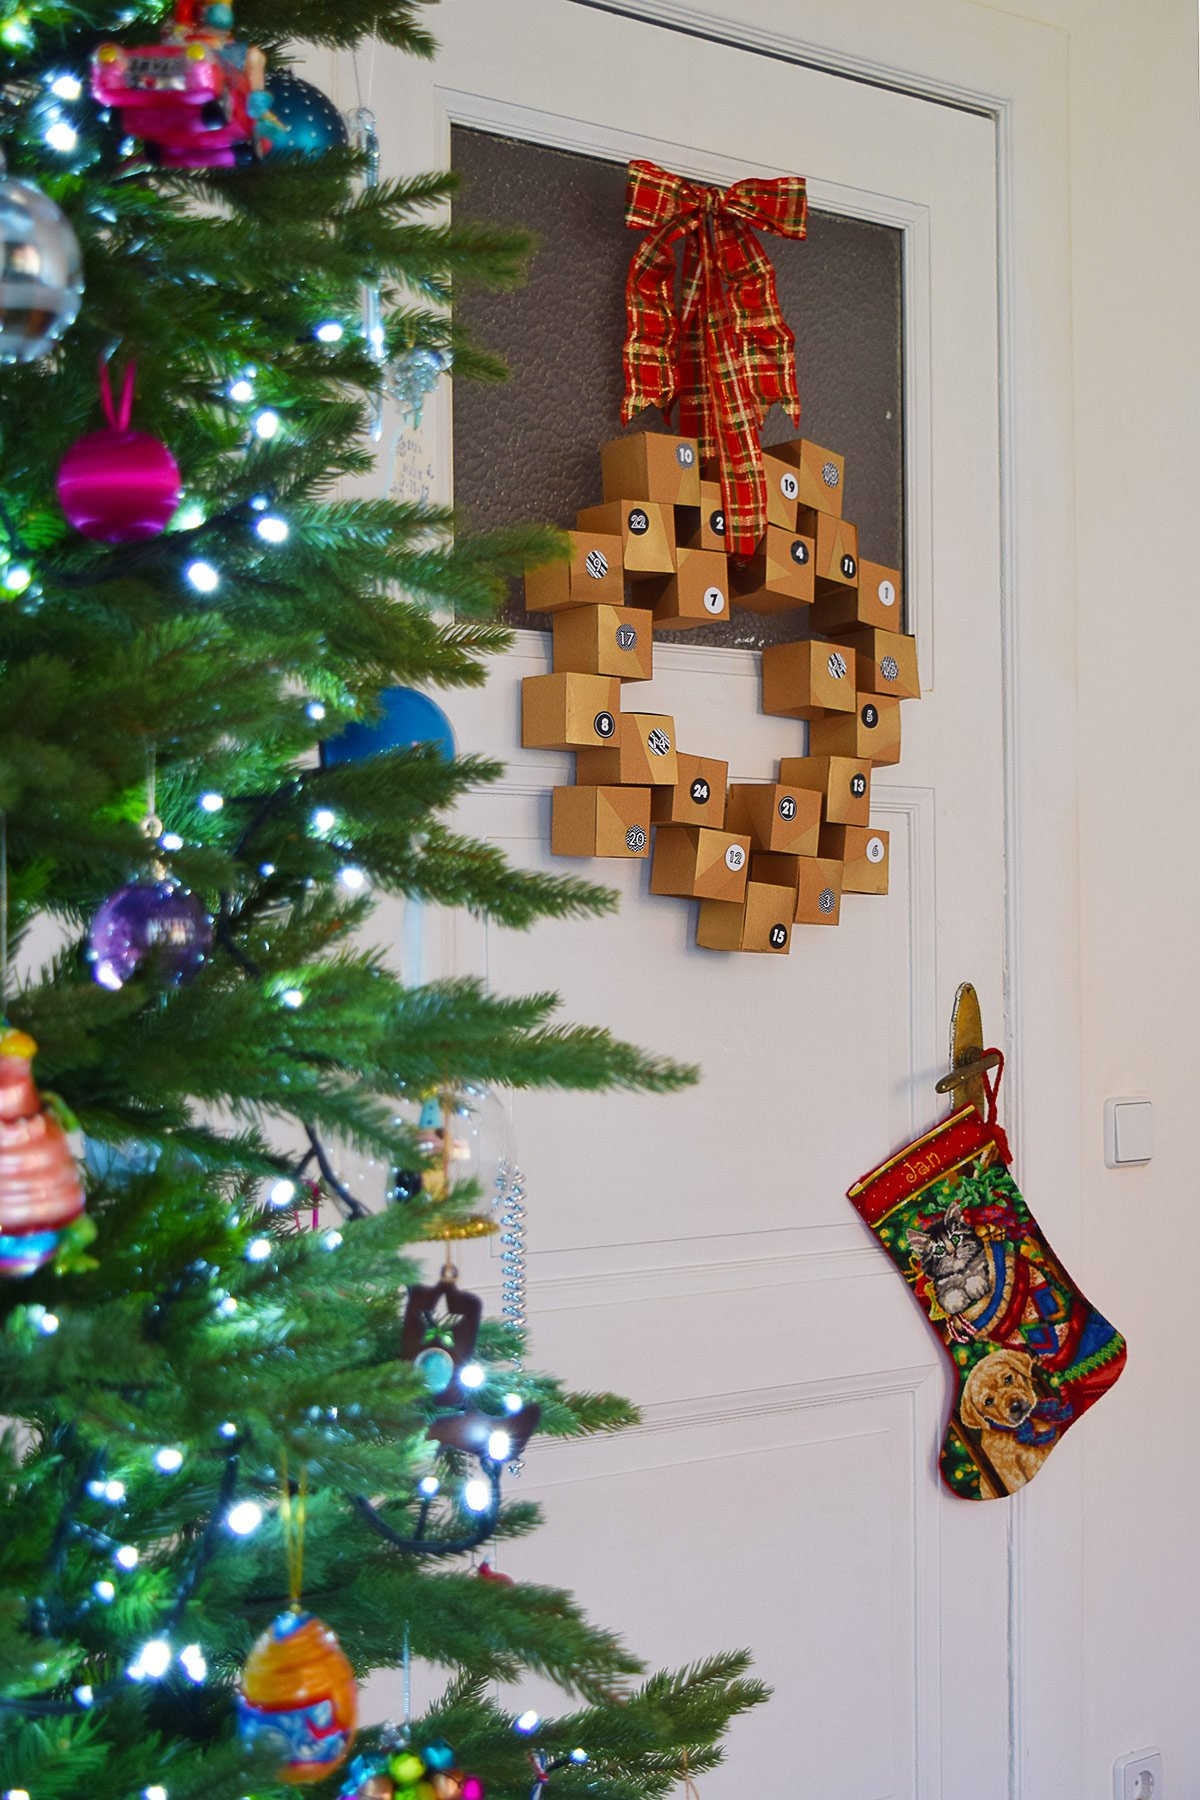 Best ideas about Advent Calendar DIY . Save or Pin DIY Advent Calendar Wreath A Free Printable Little Now.